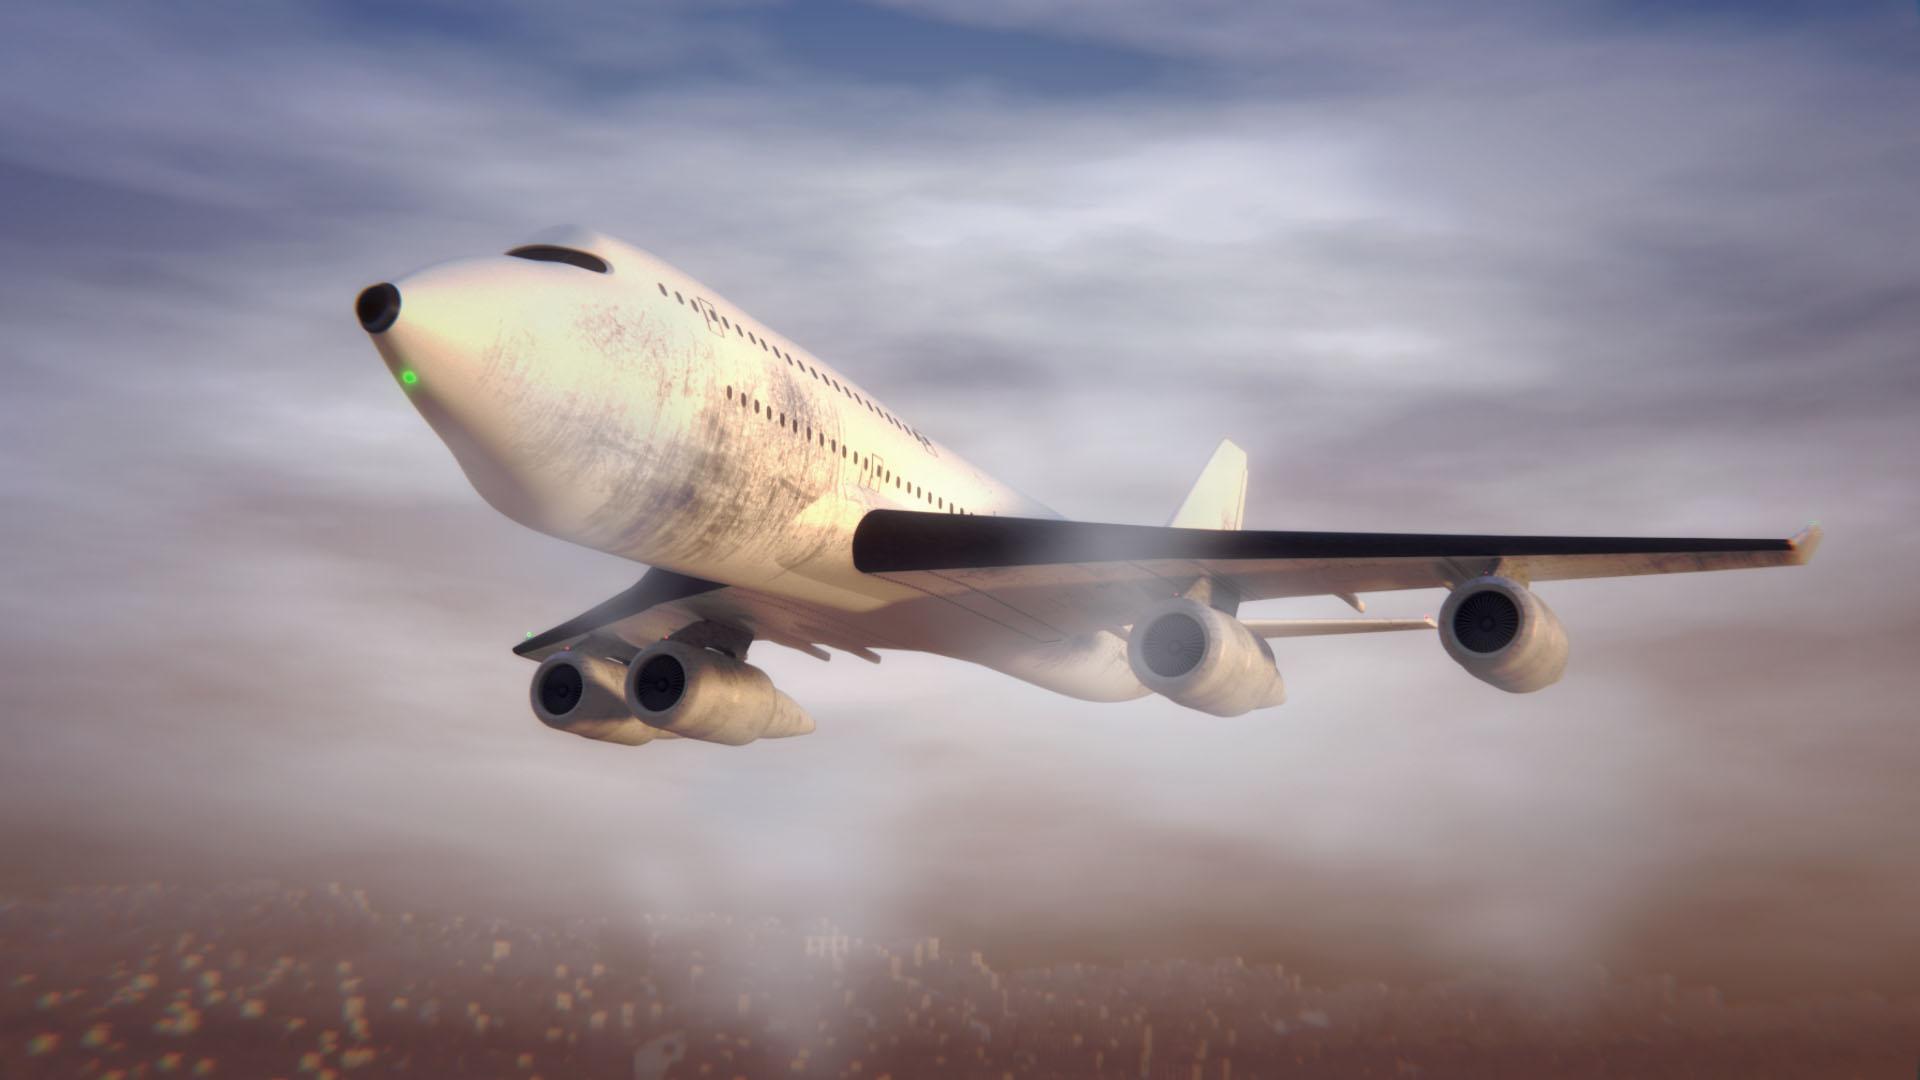 Change of Planes